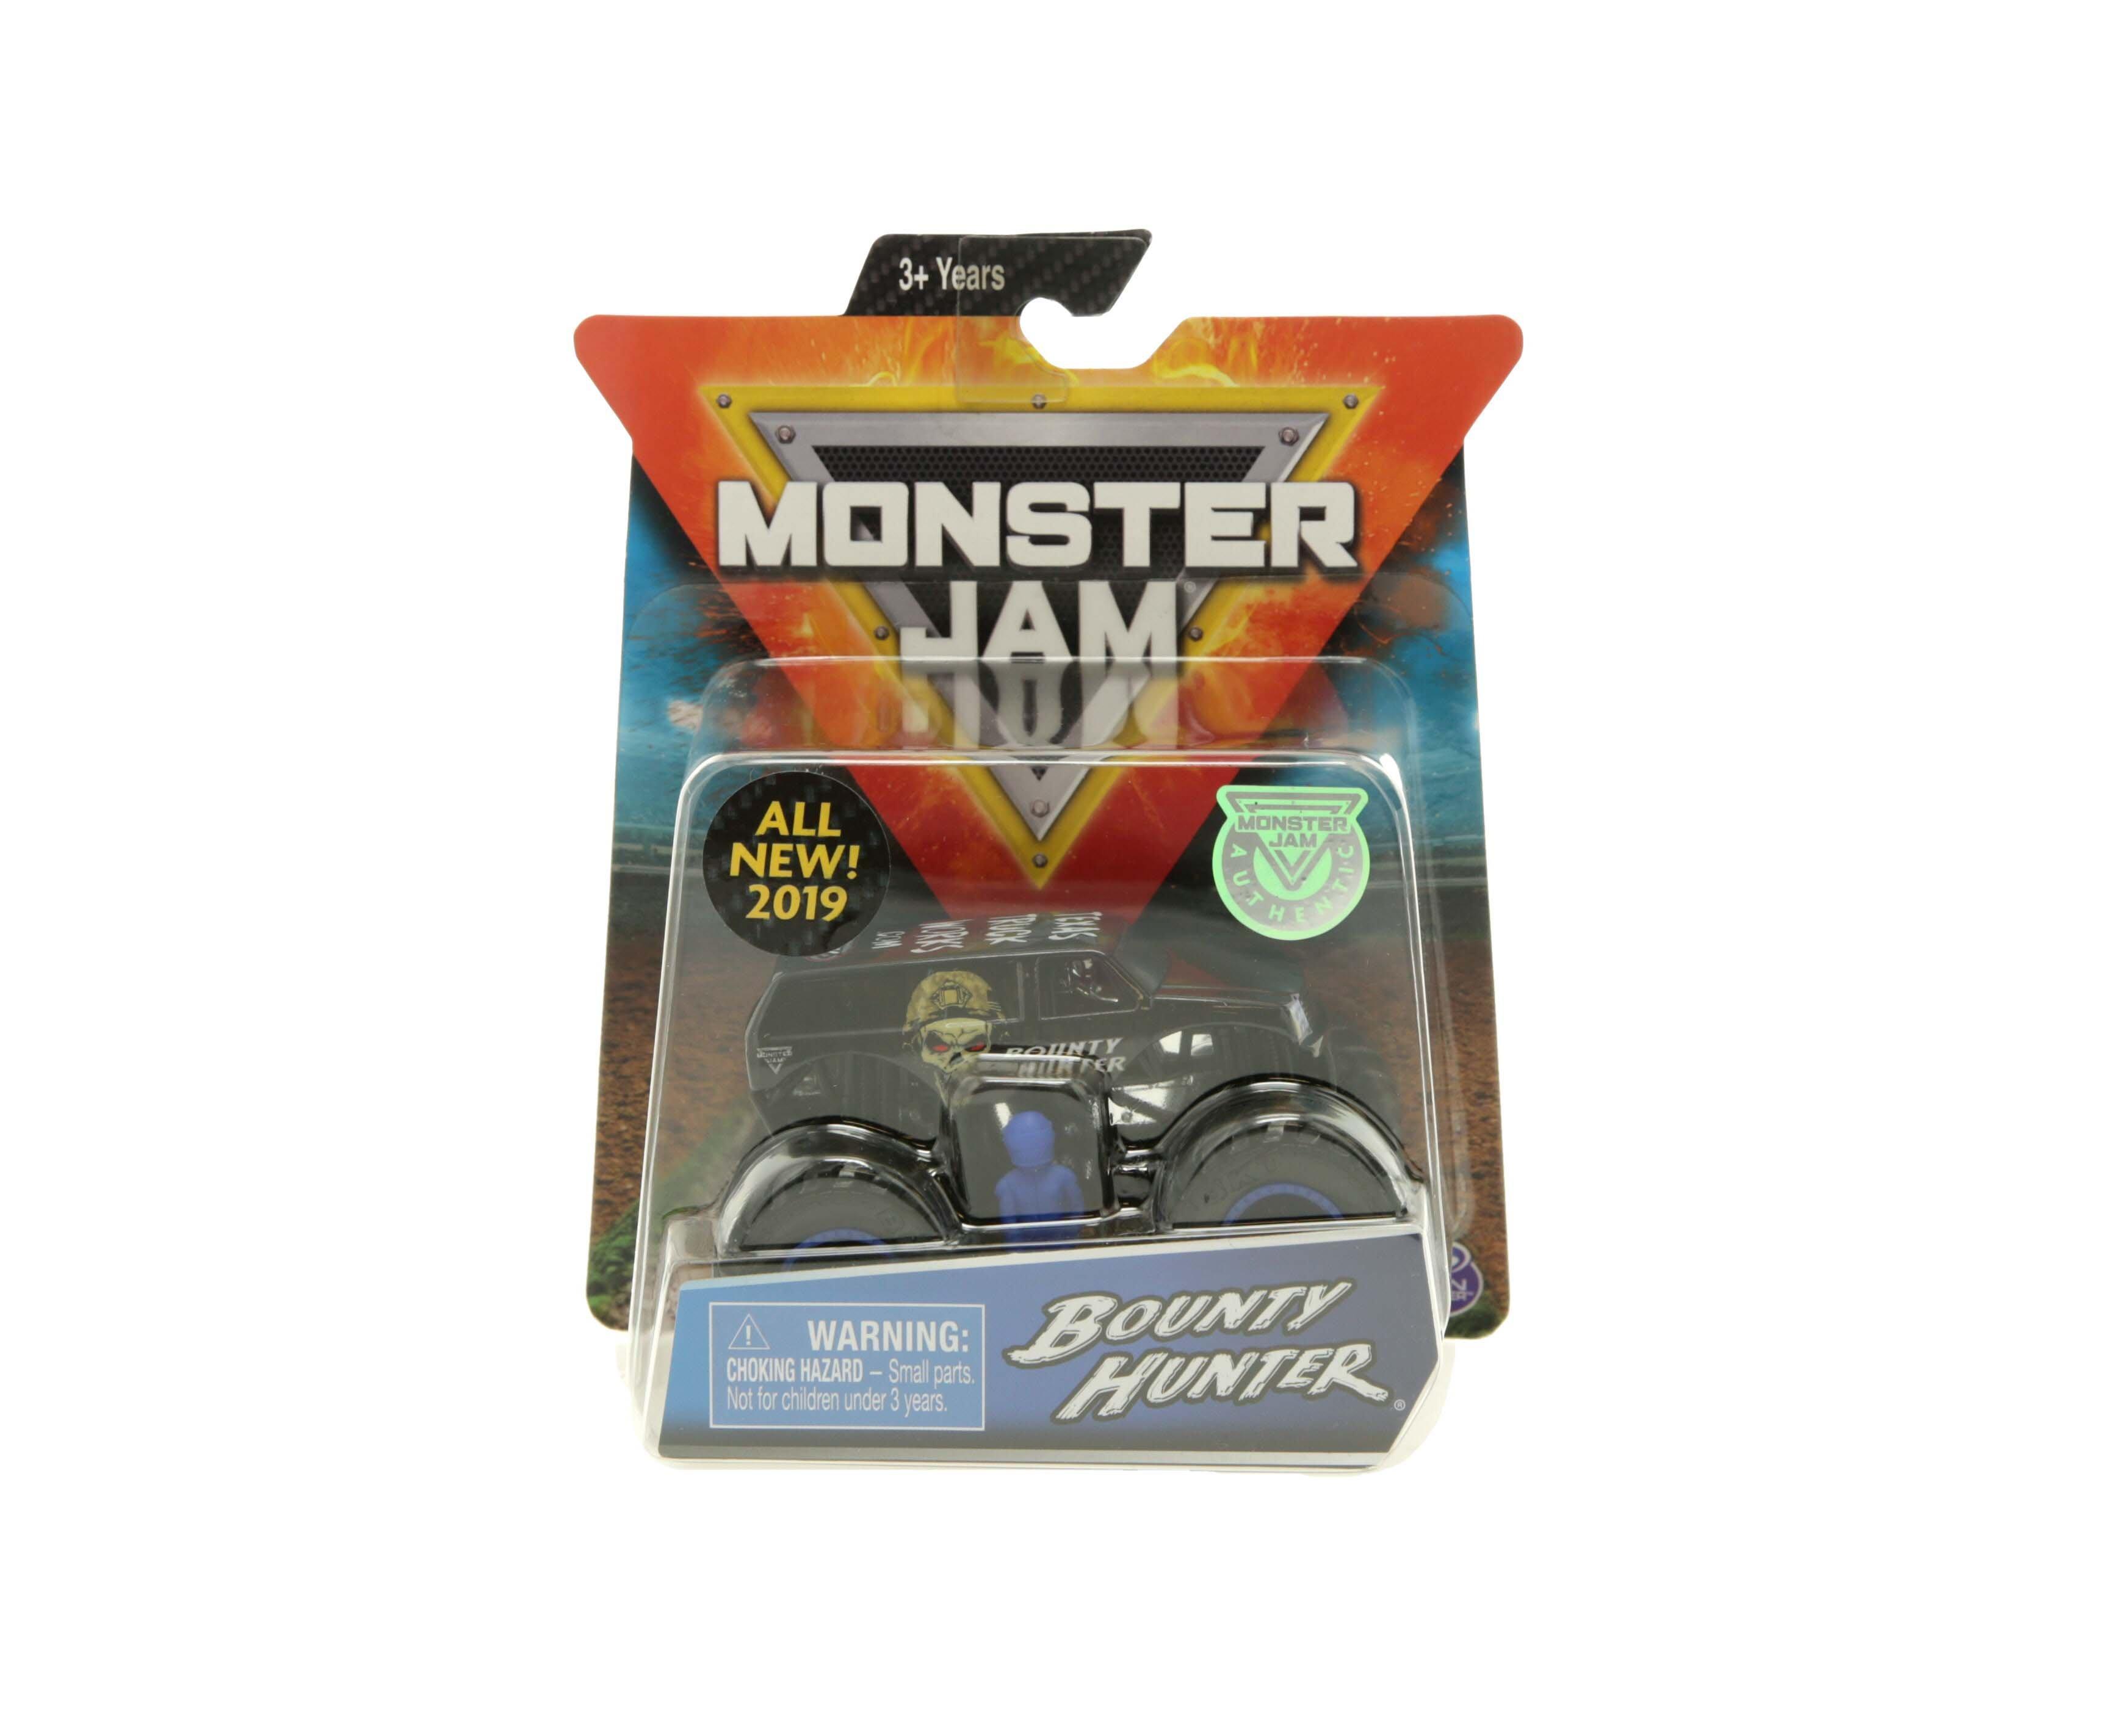 Monster Jam Bounty Hunter Vehicle Pack | GameStop